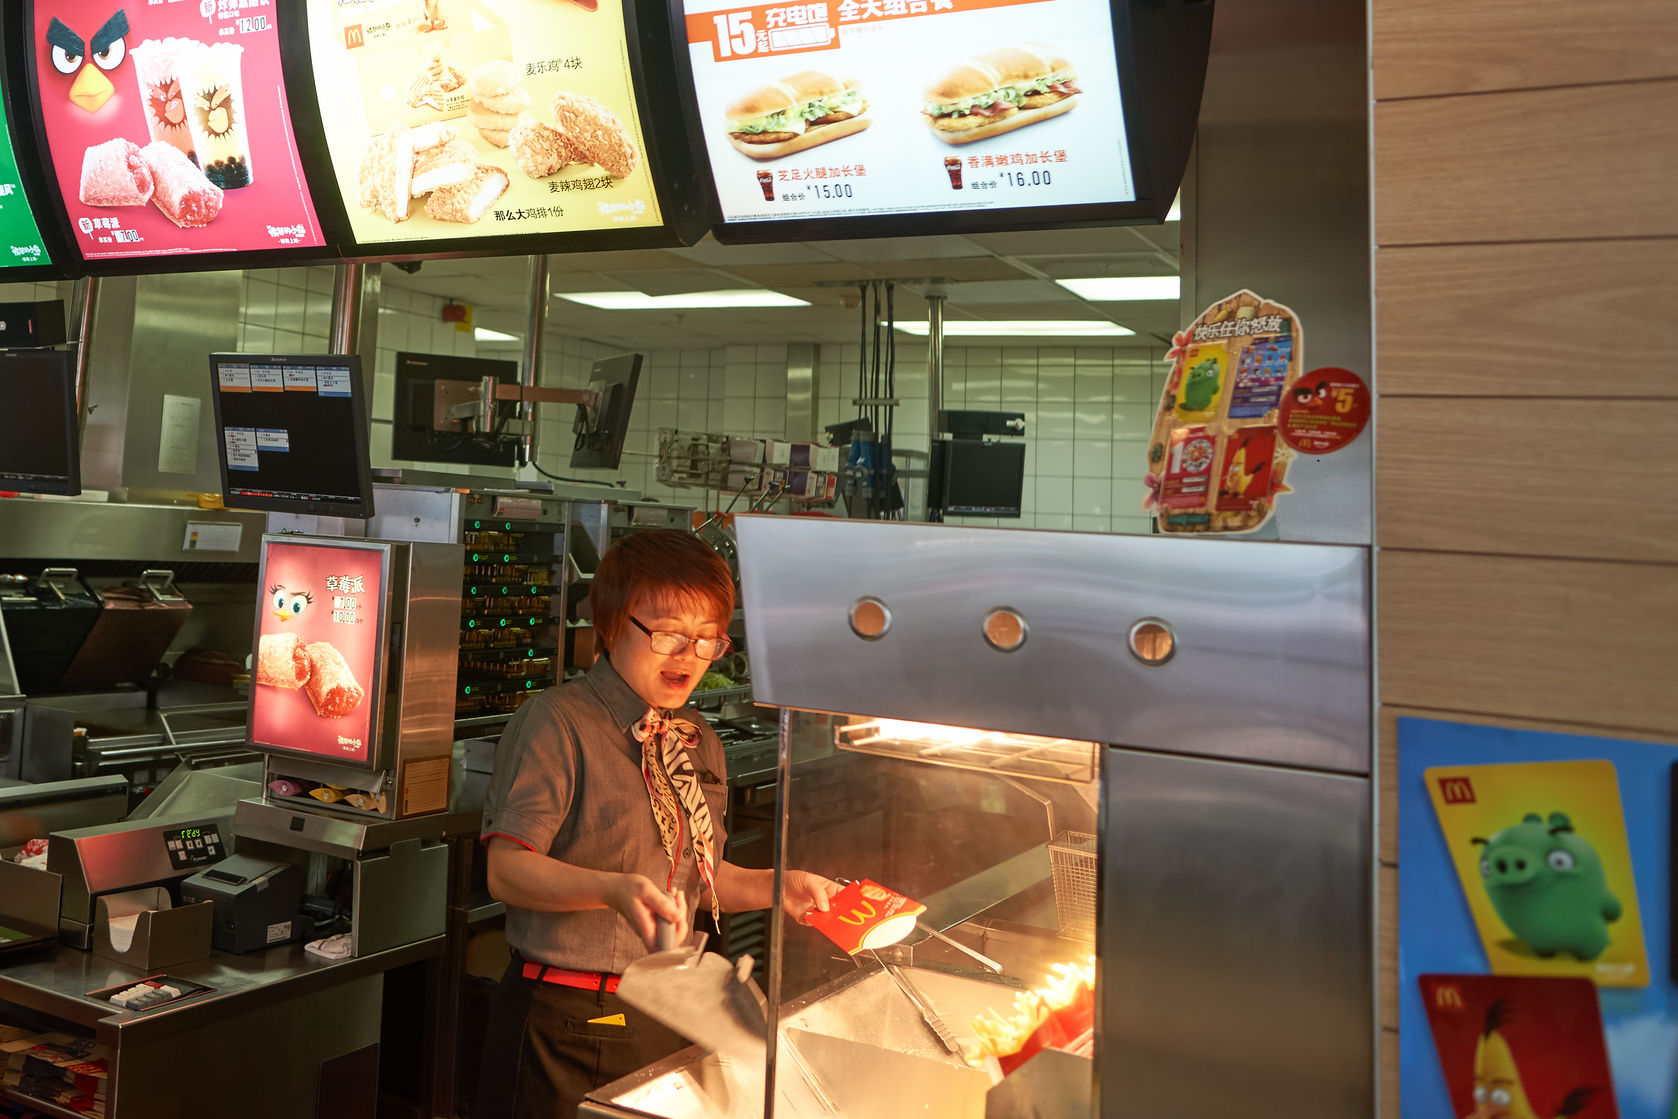 McDonalds, fast food